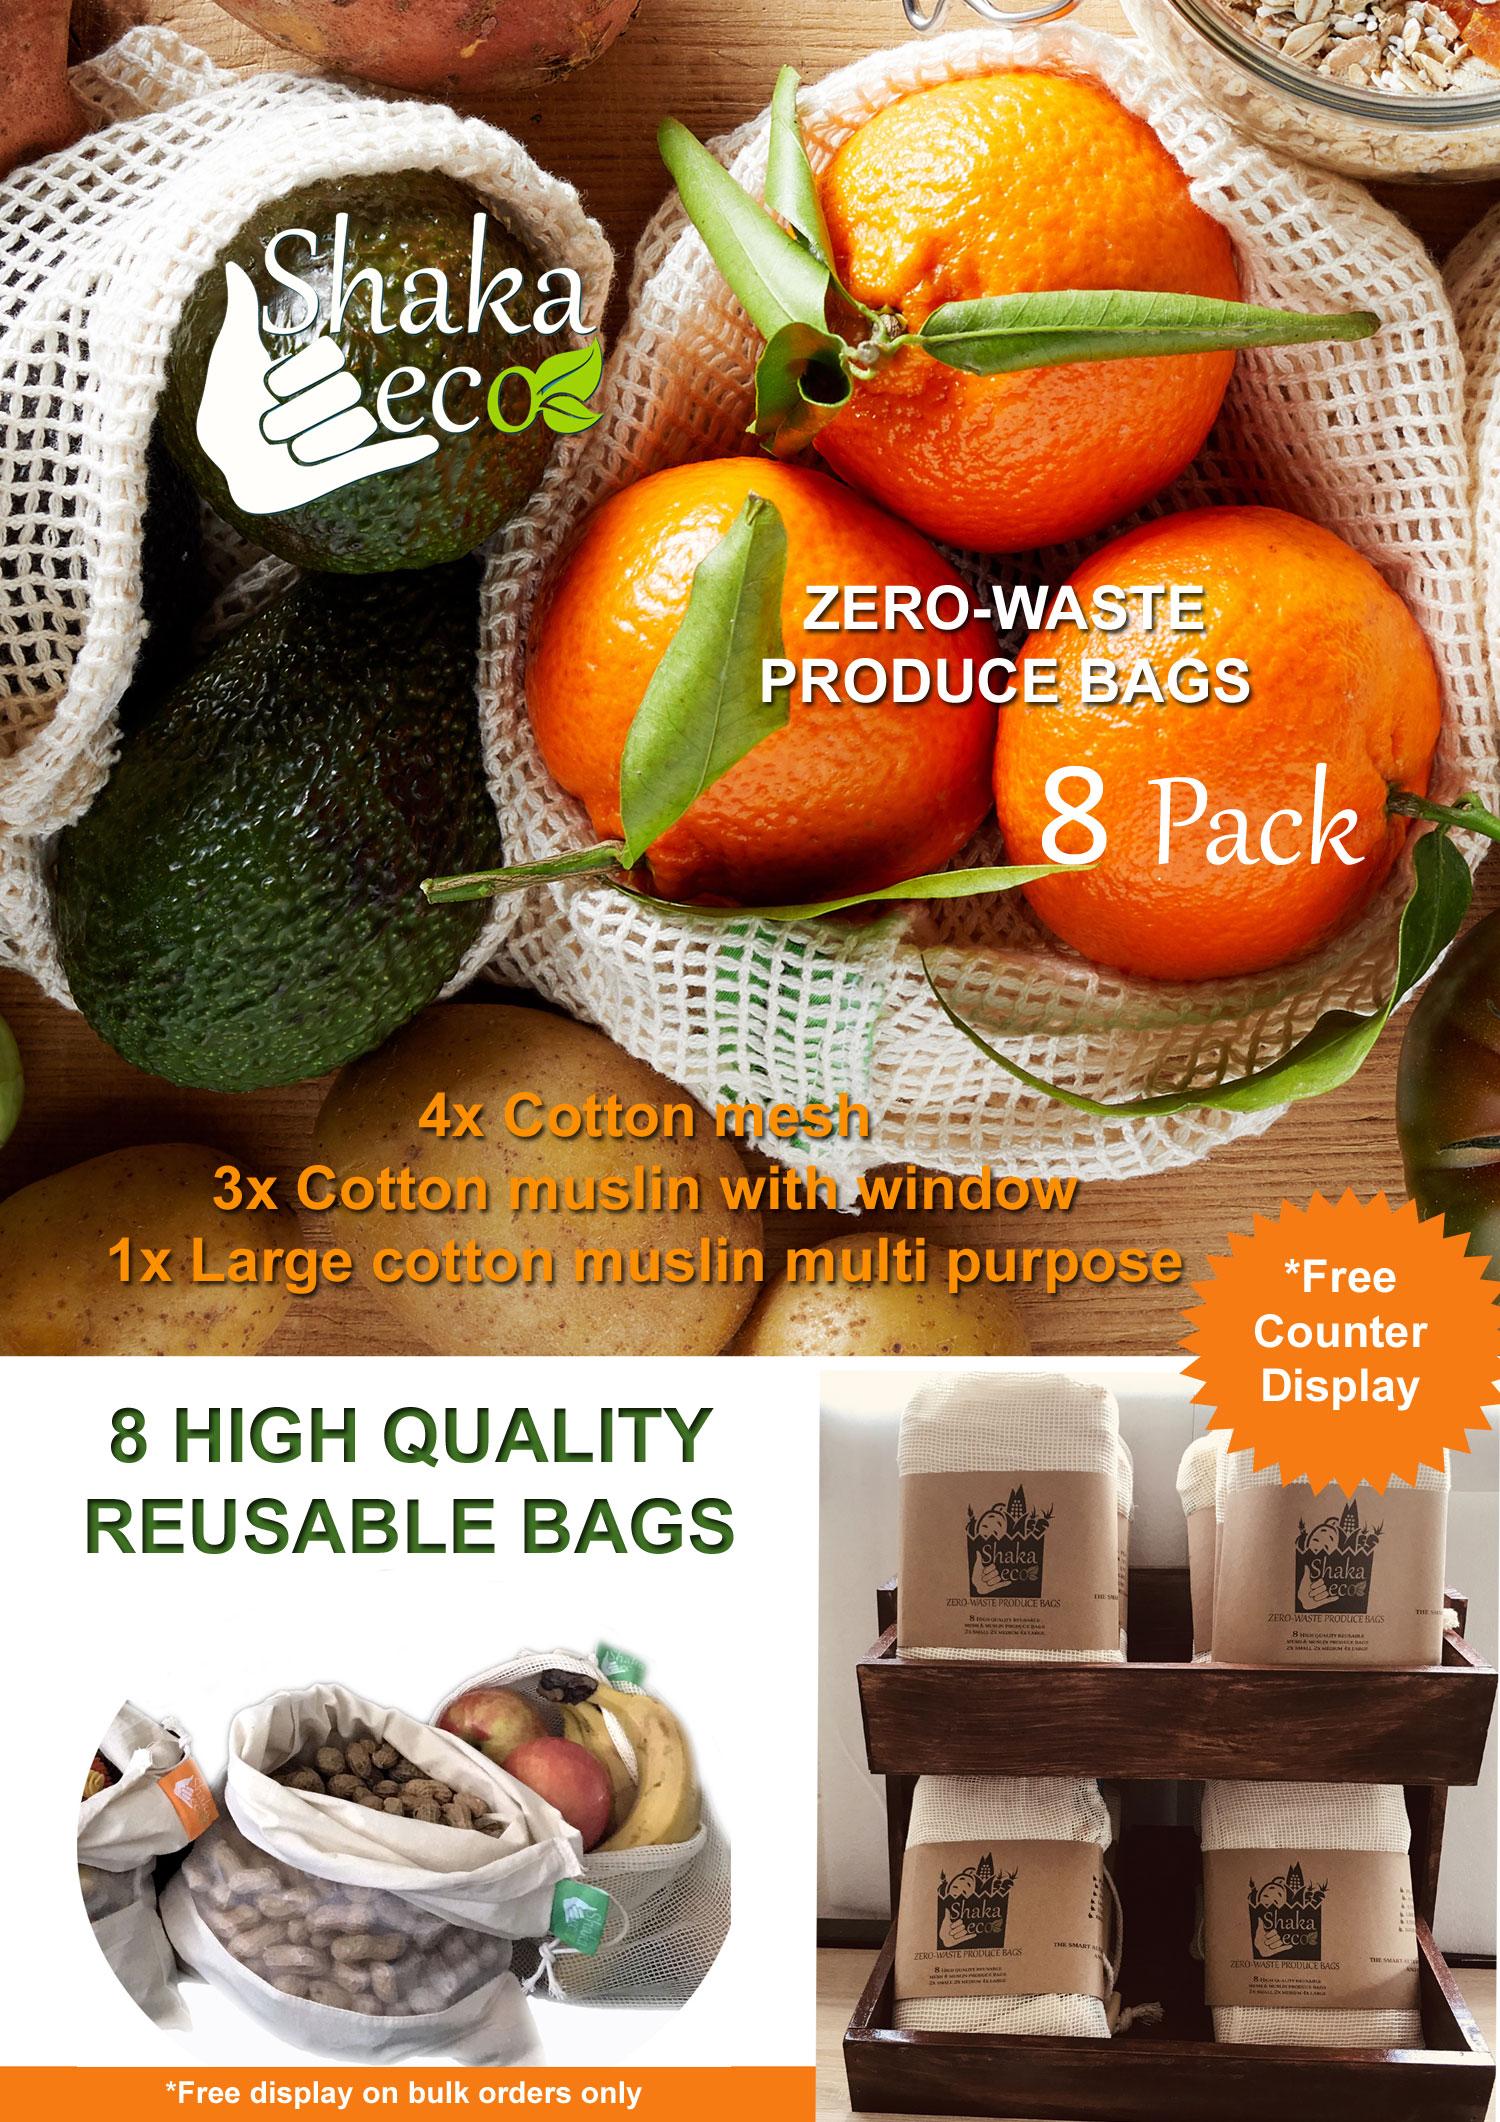 Shaka Eco Produce Bag 8Pk